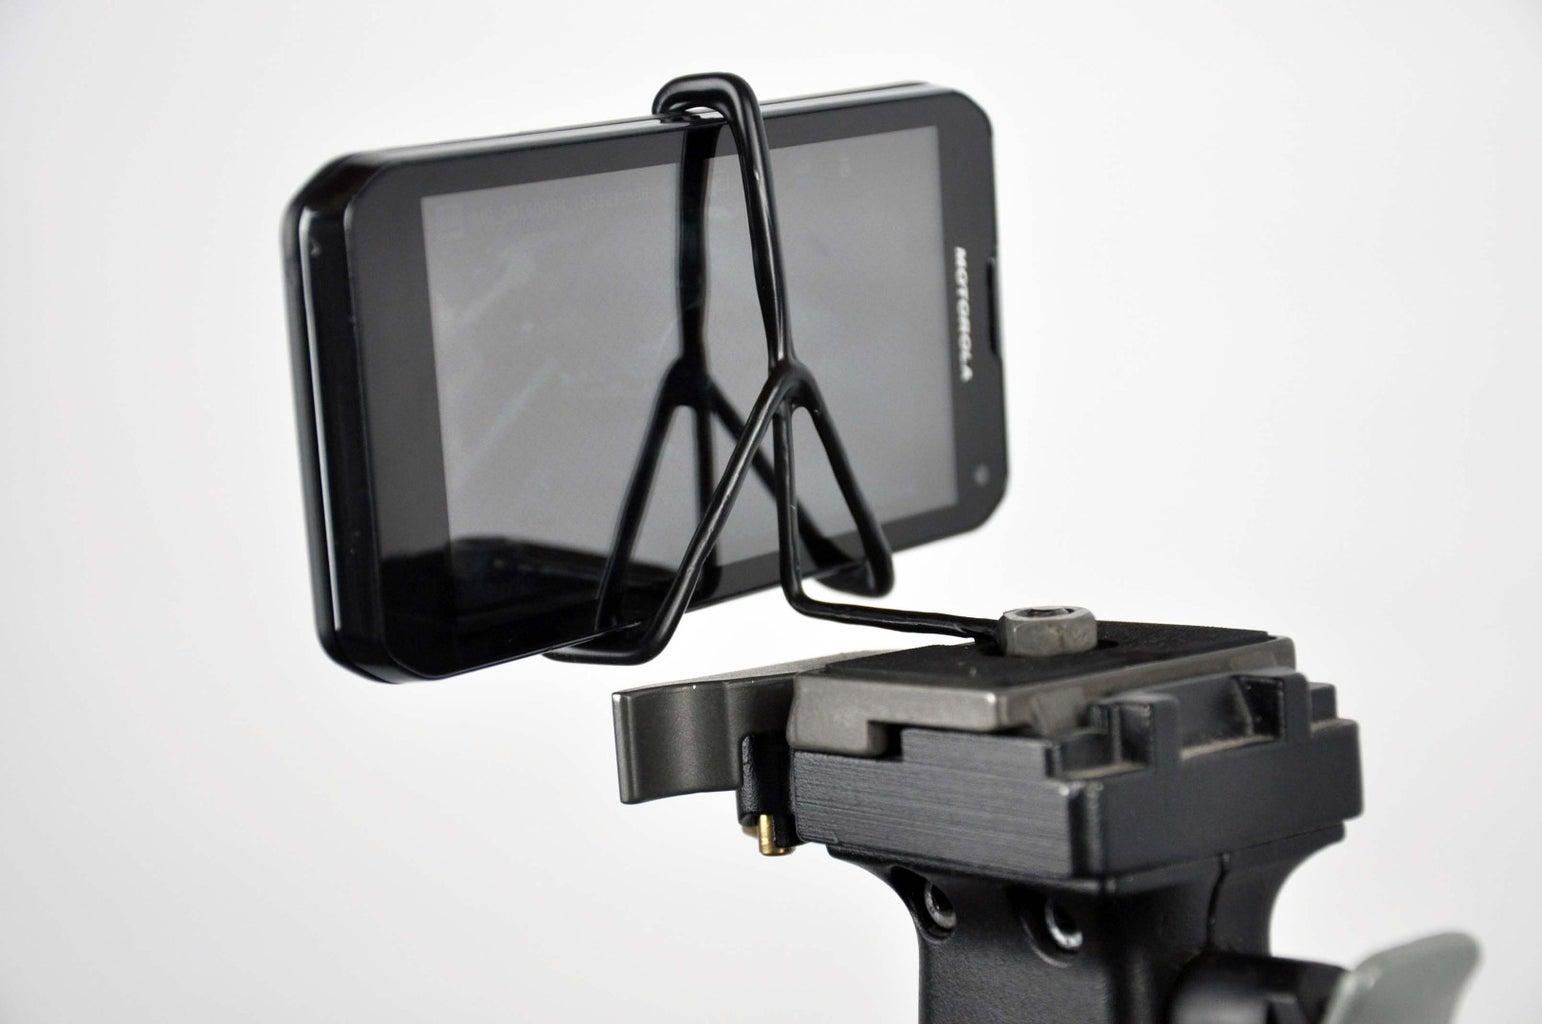 How to Make (Torch Braze) a Smart Phone Tripod Mount